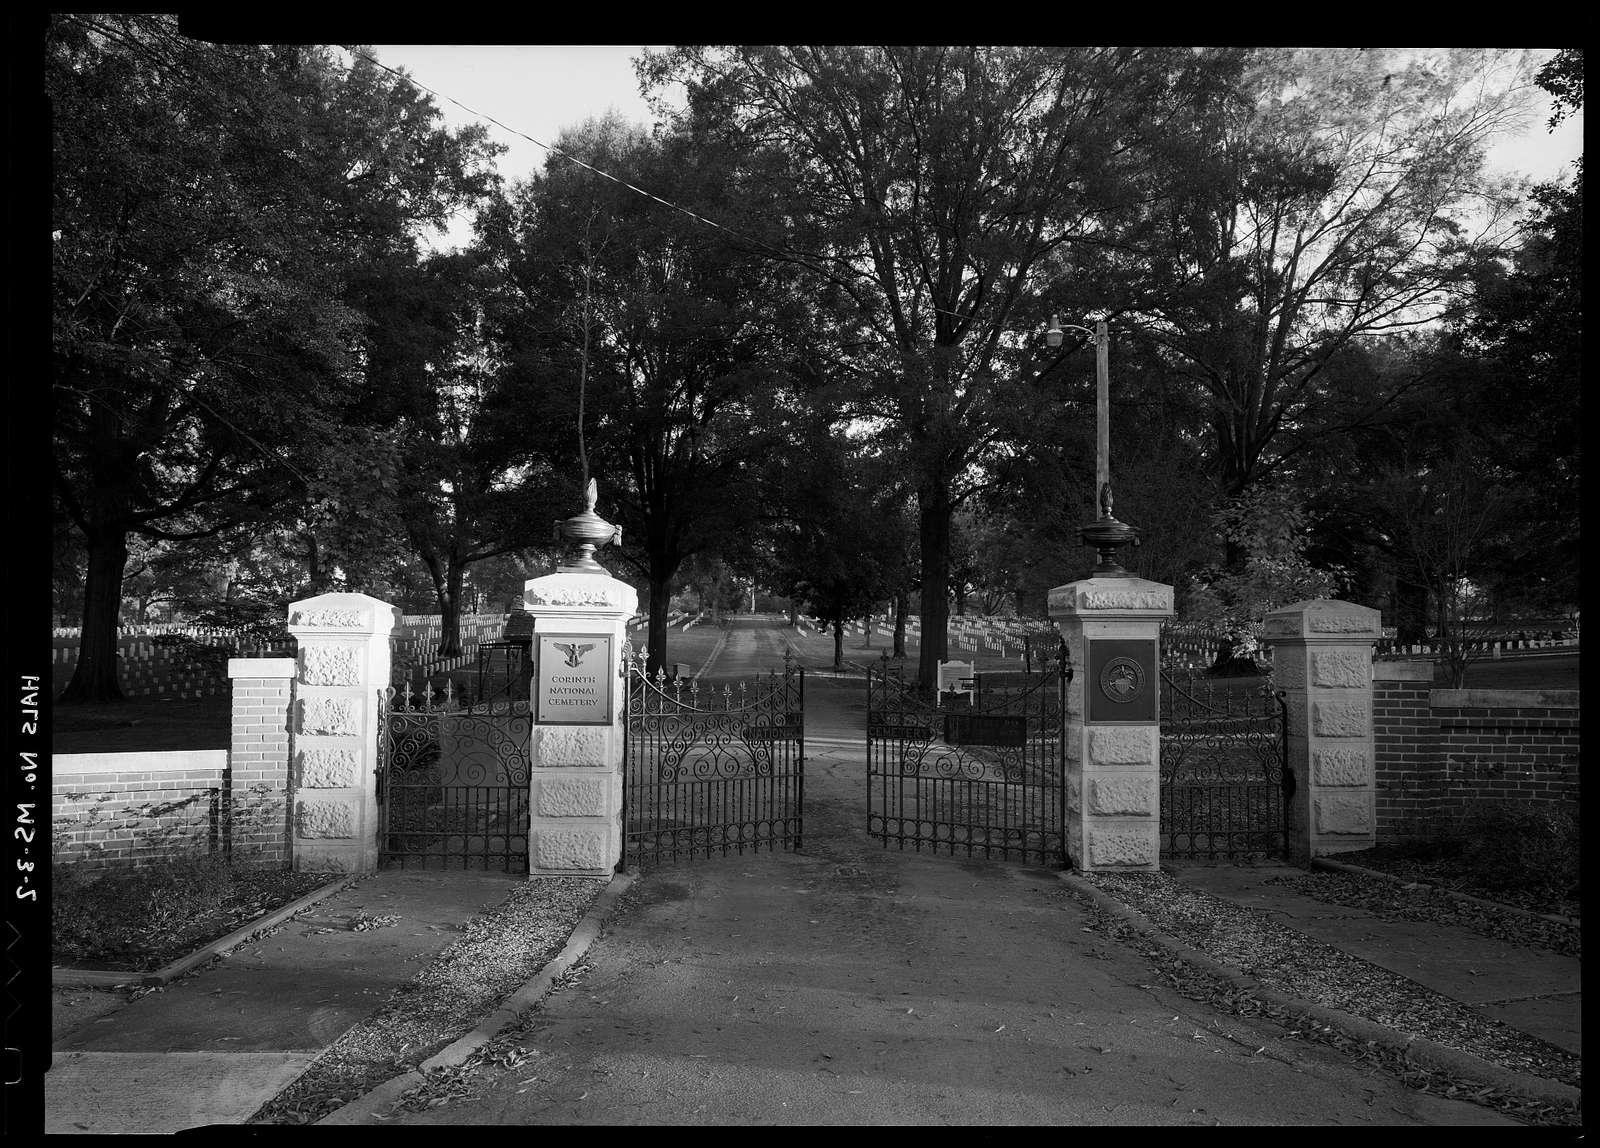 Corinth National Cemetery, 1551 Horton Street, Corinth, Alcorn County, MS